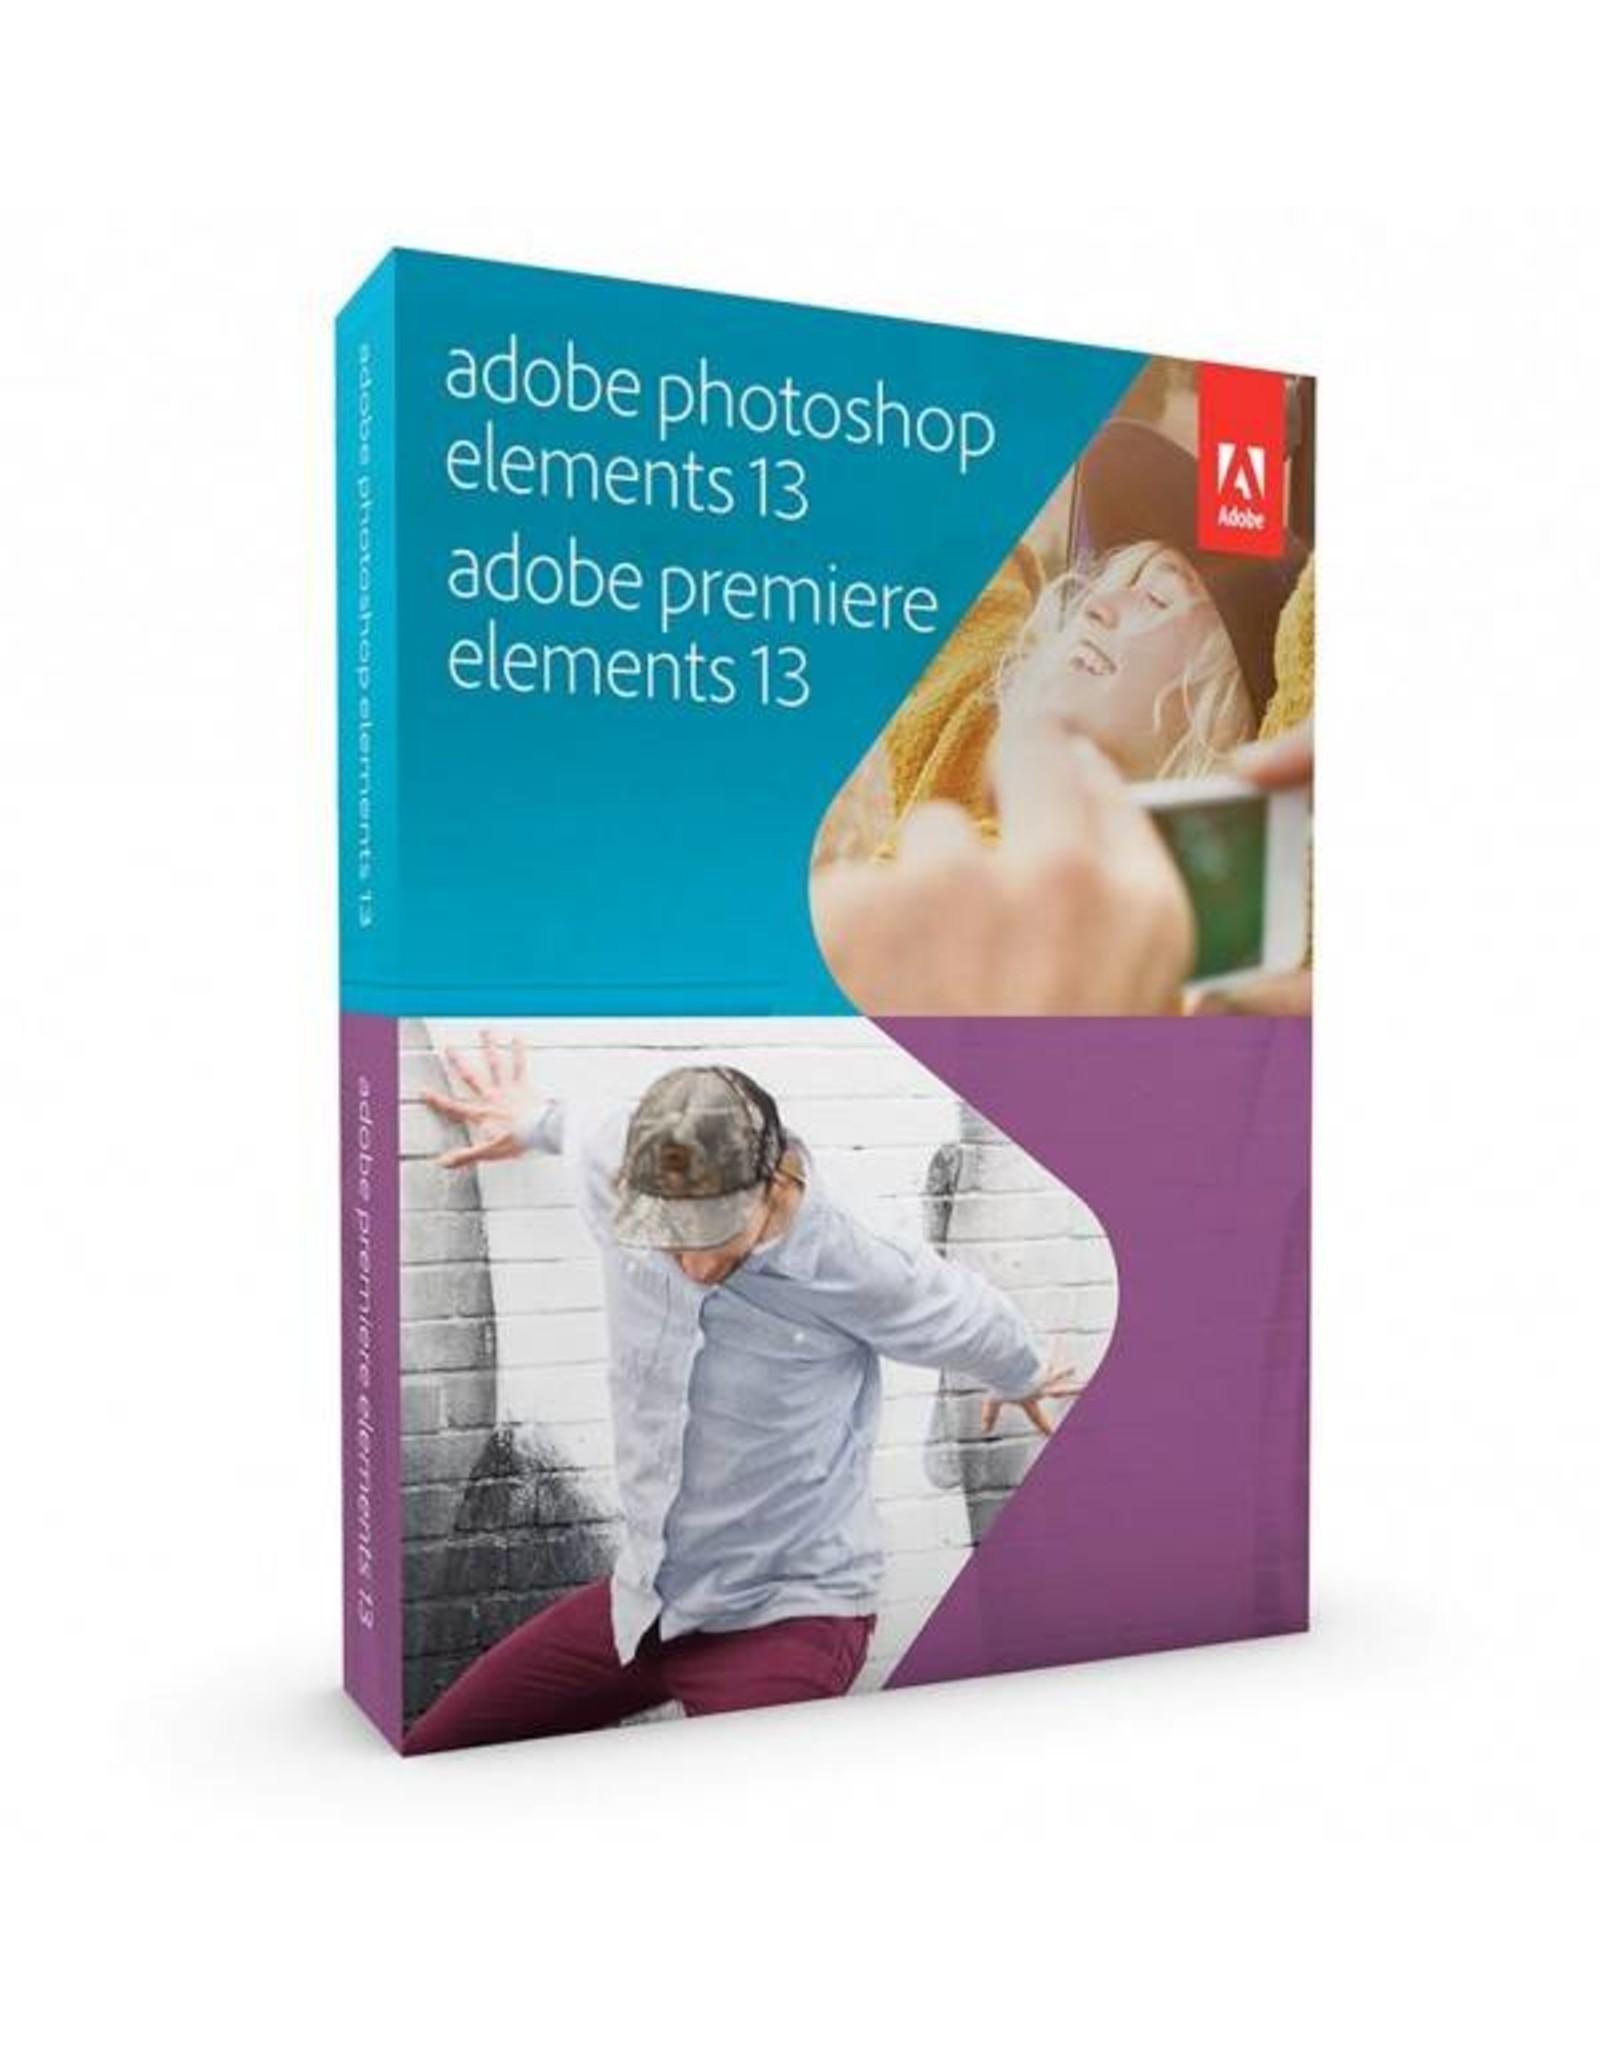 Adobe Adobe Photoshop Elements 13 & Adobe Premiere Elements 13